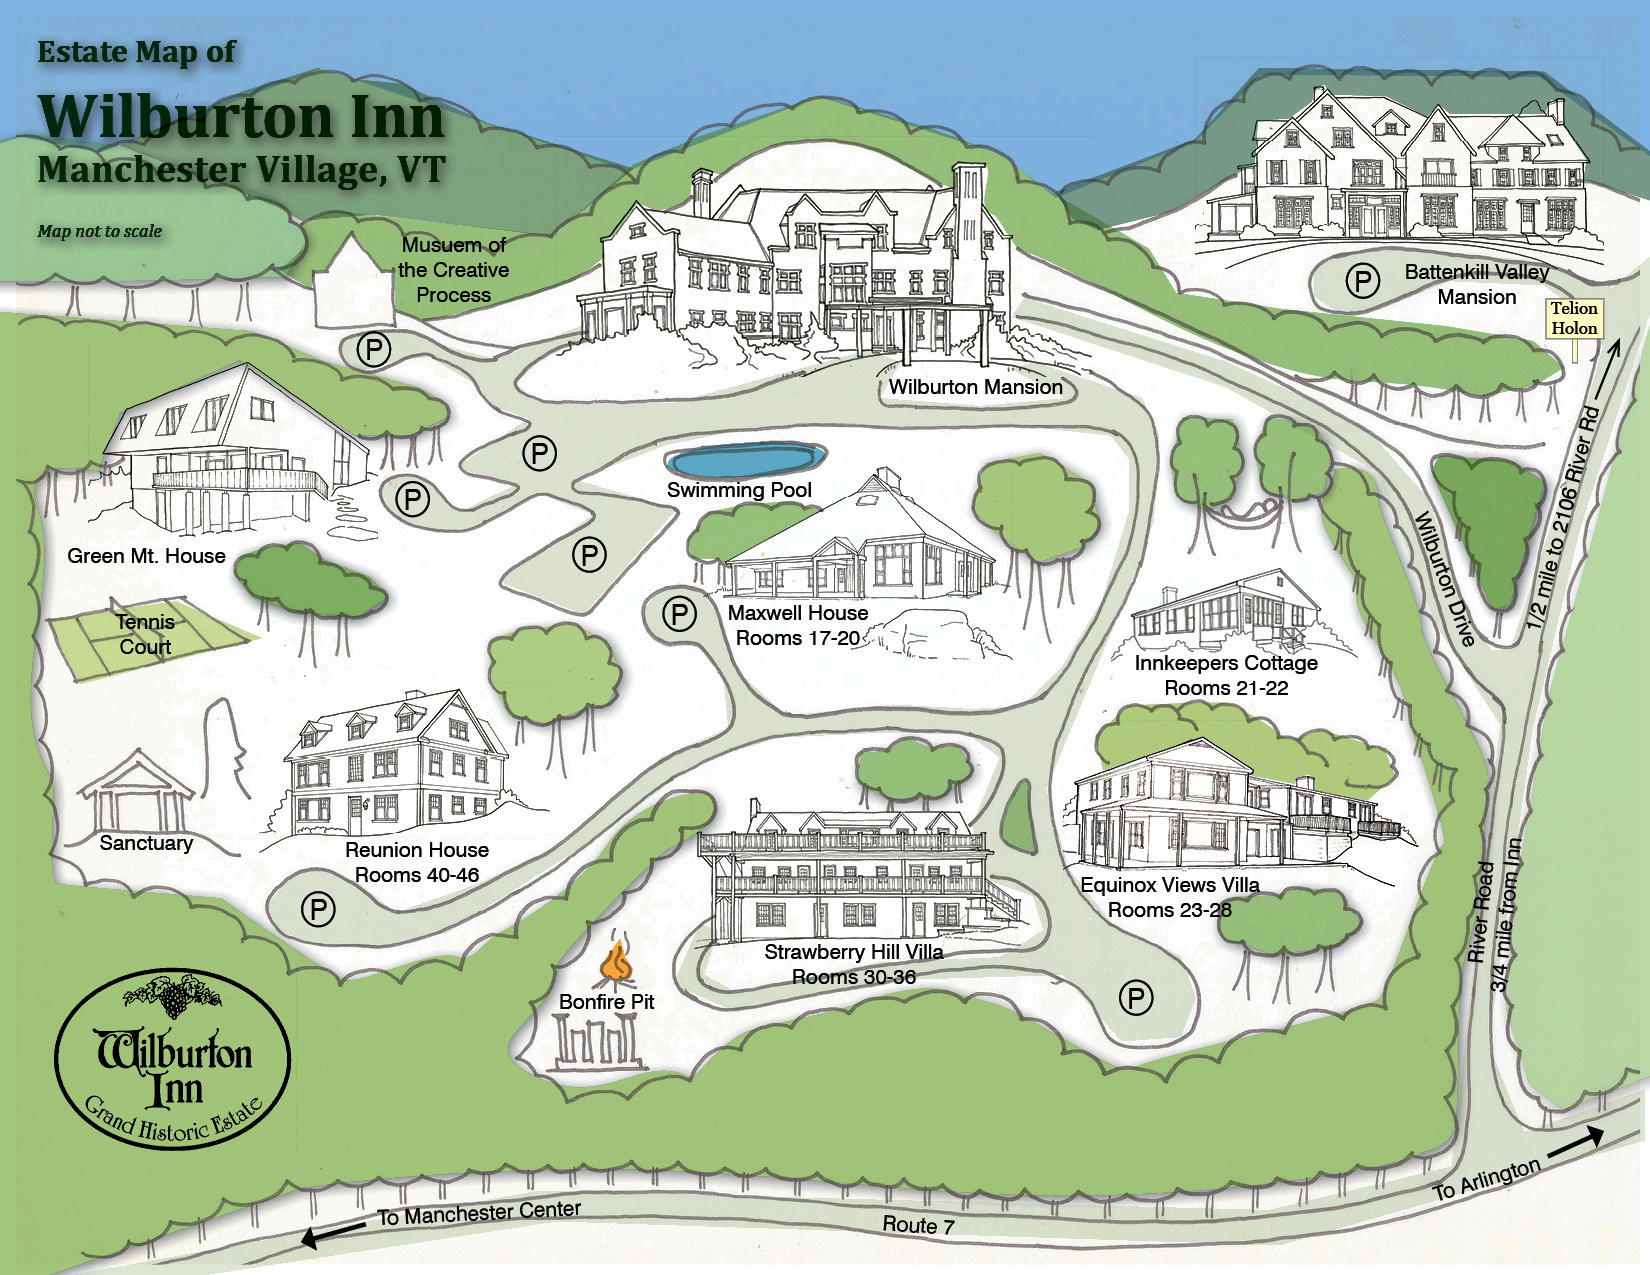 Wilburton Inn Property Map